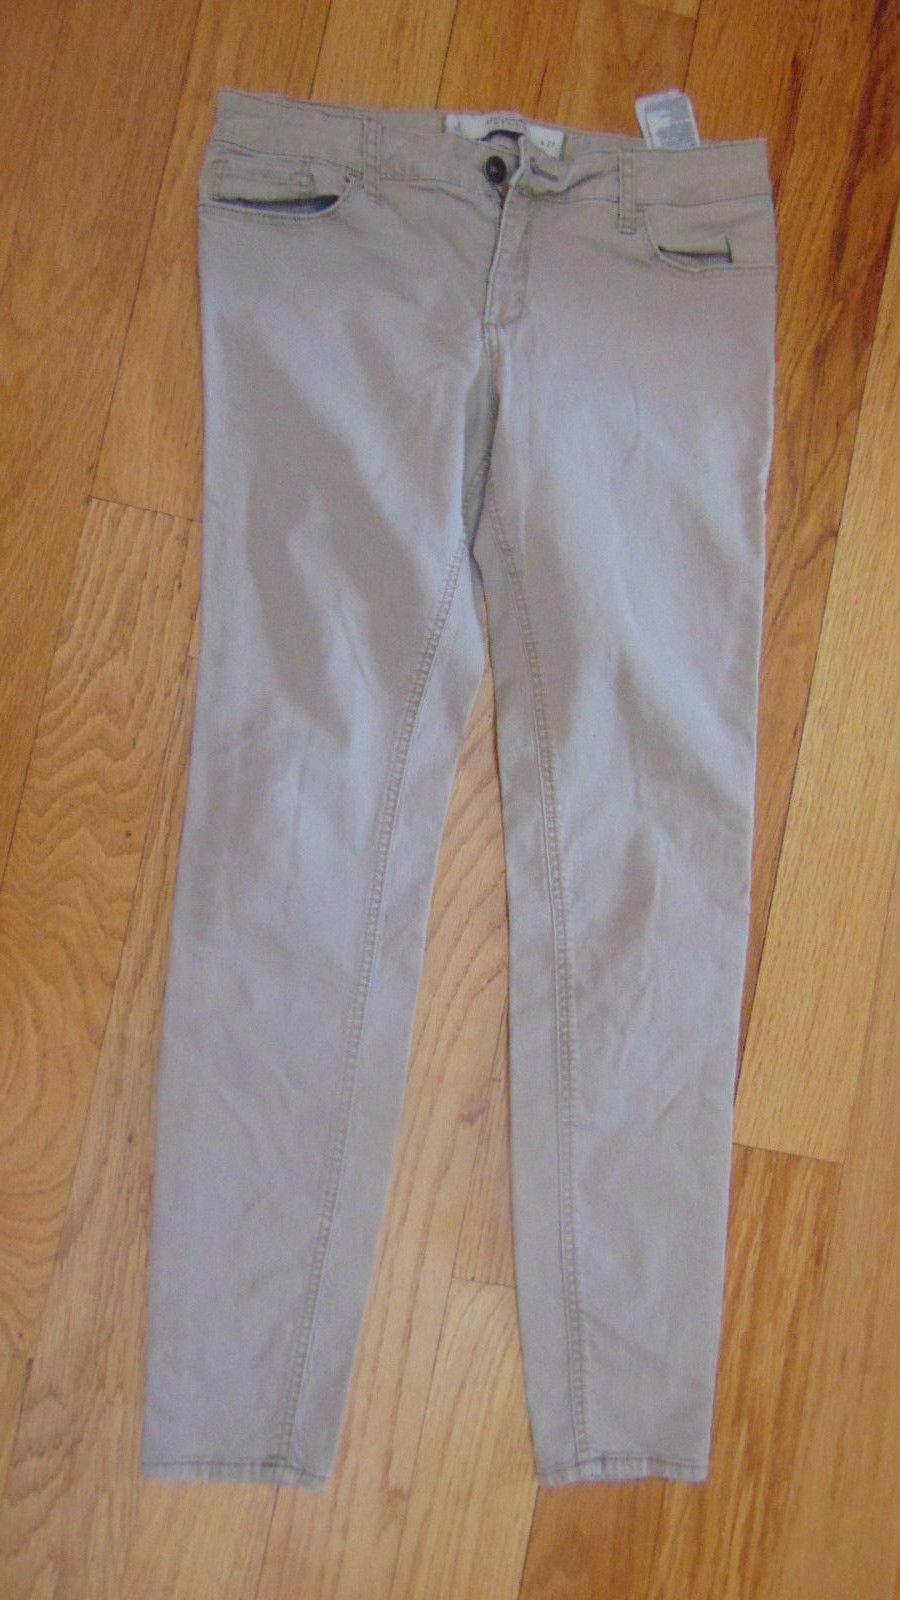 Girls Abercrombie & Fitch Size 4-Stove Pipe Leg-Khaki Color-T-Shirt-Blouse-